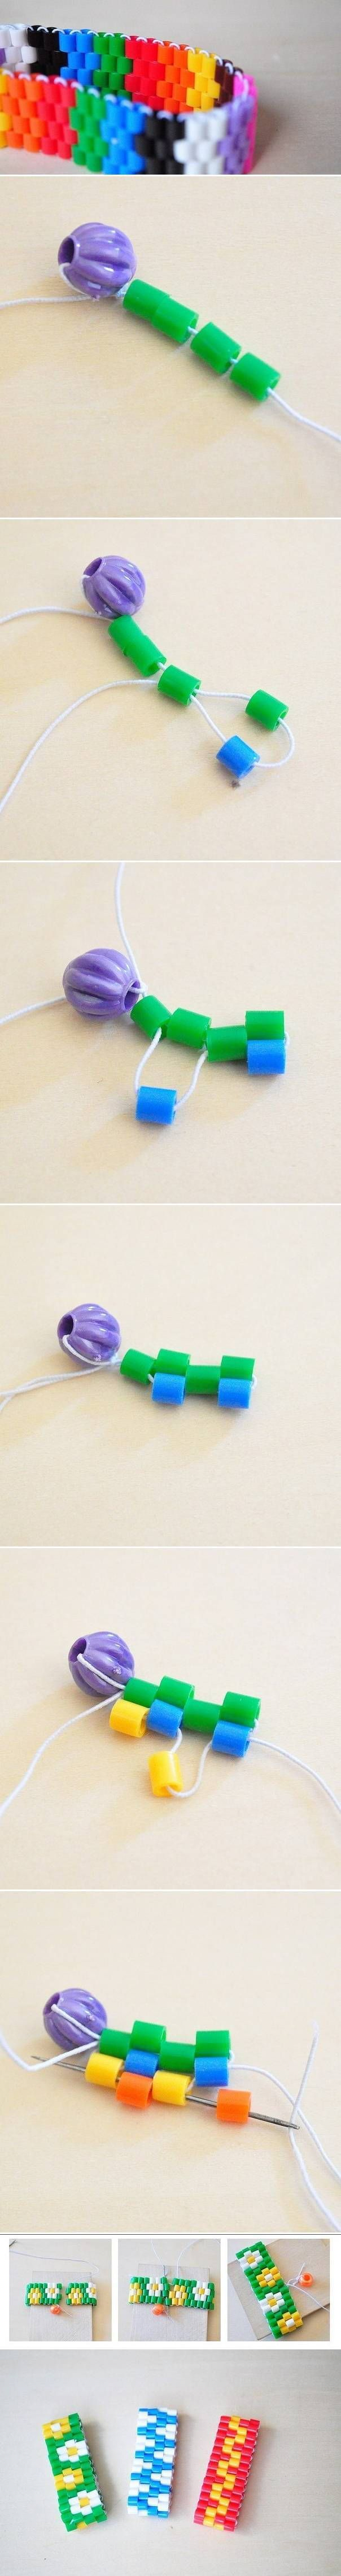 DIY Colorful Bracelet DIY Colorful Bracelet